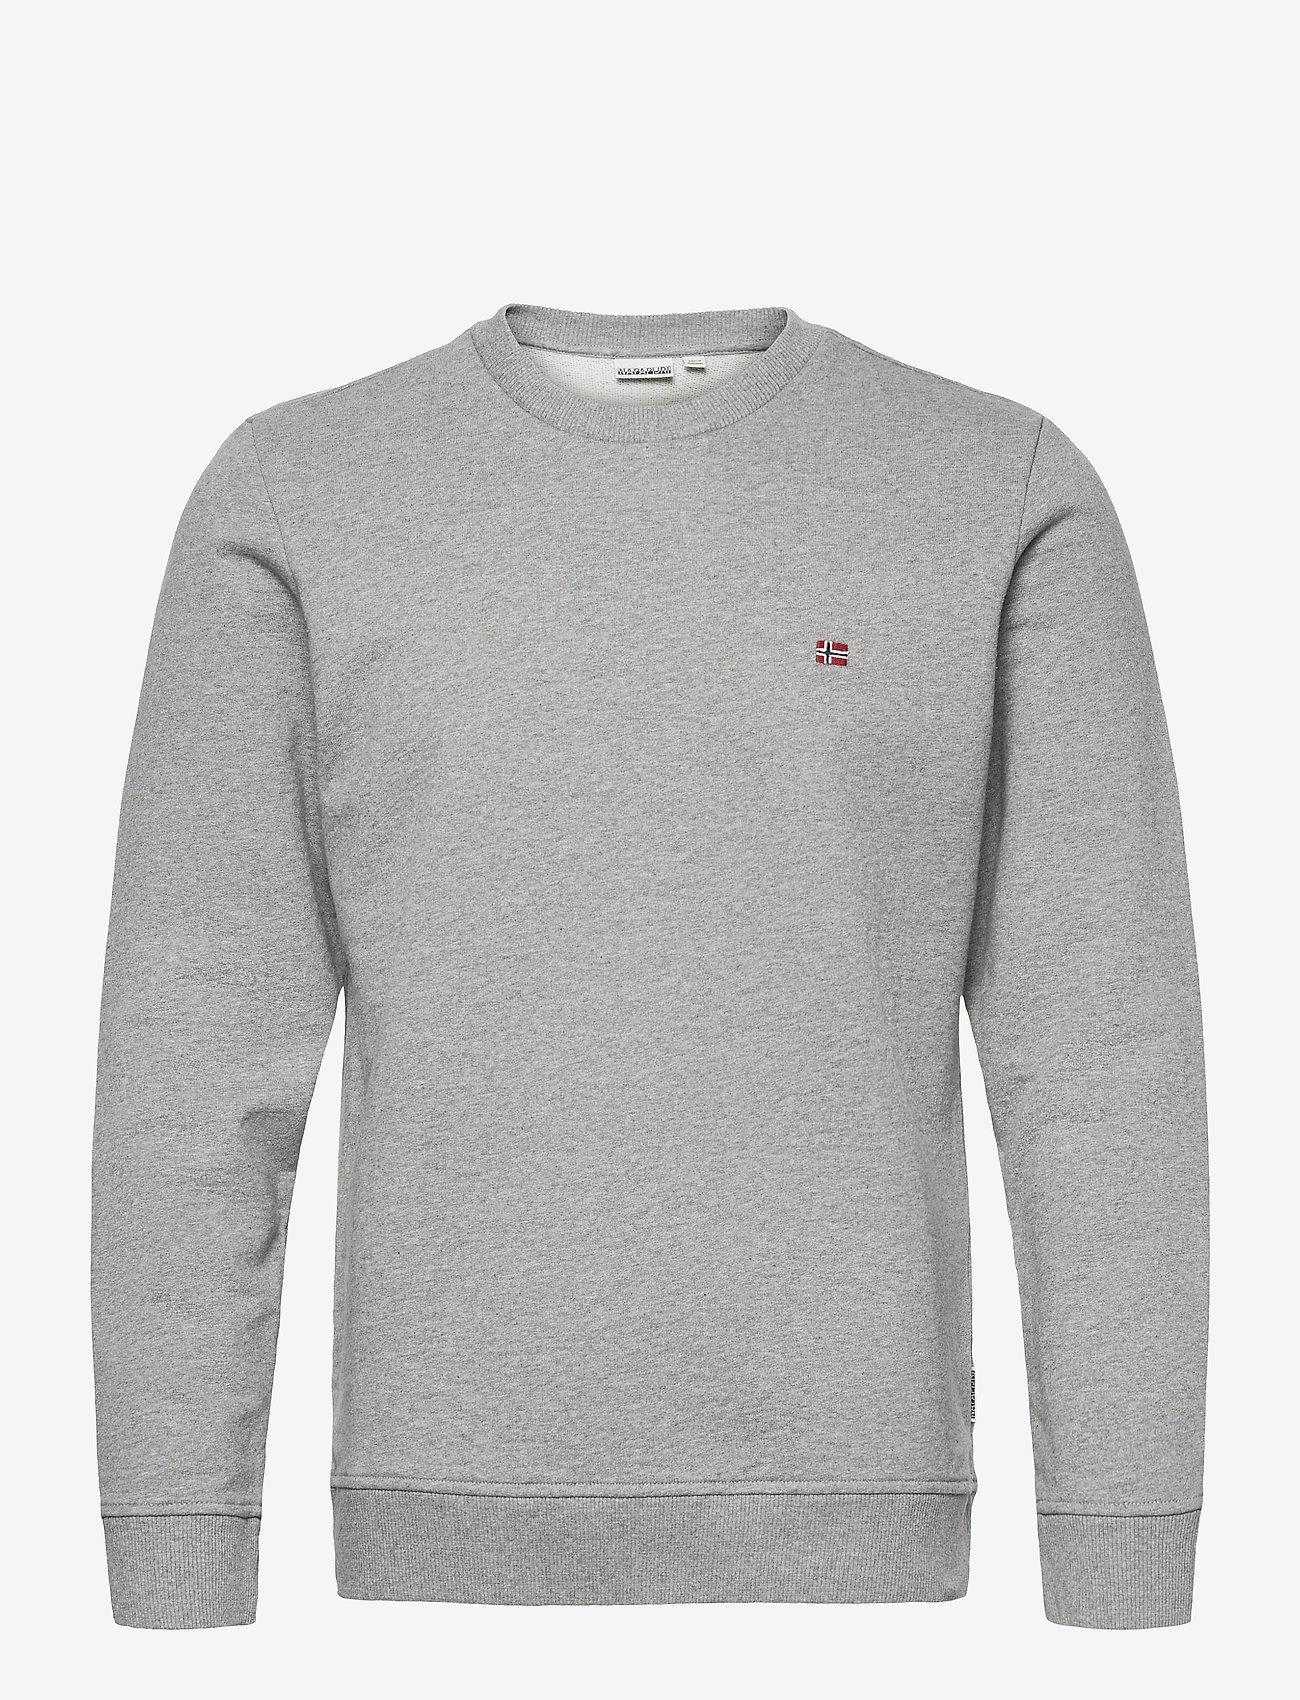 Napapijri - BALIS CREW - tricots basiques - med grey melange - 1